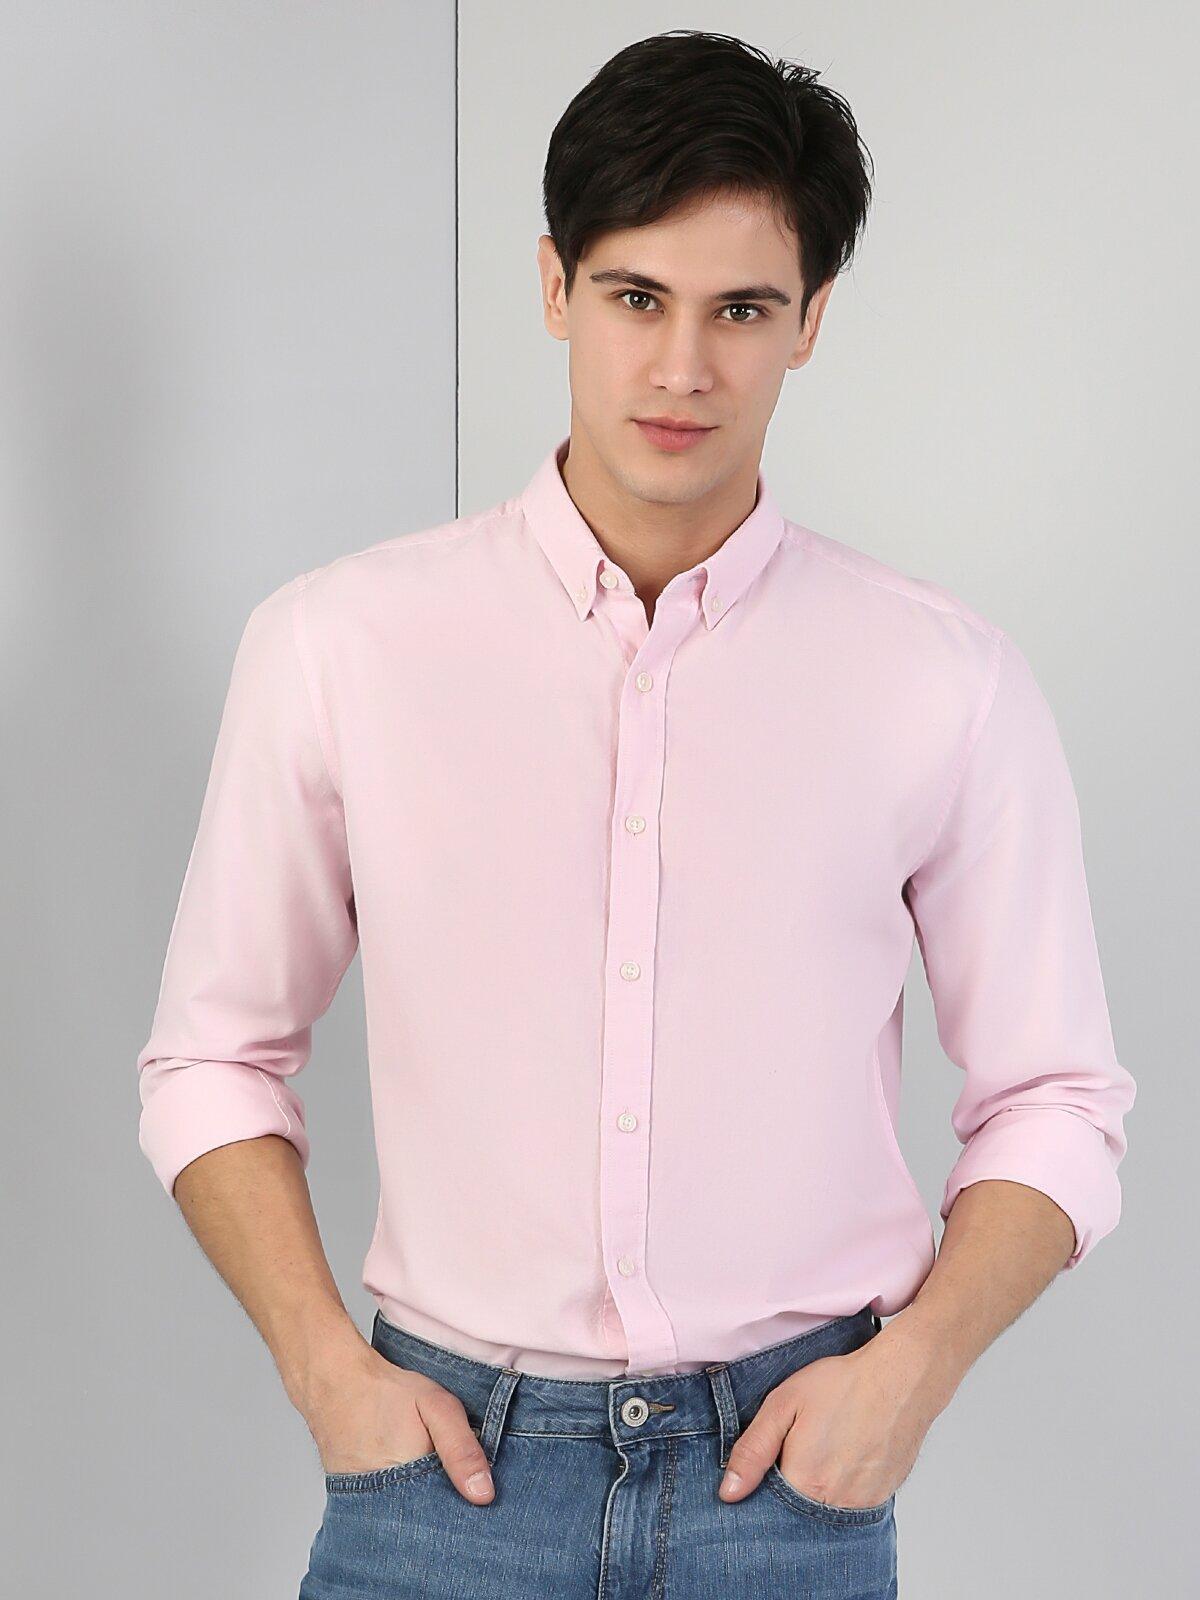 Pembe Uzun Kol Gömlek